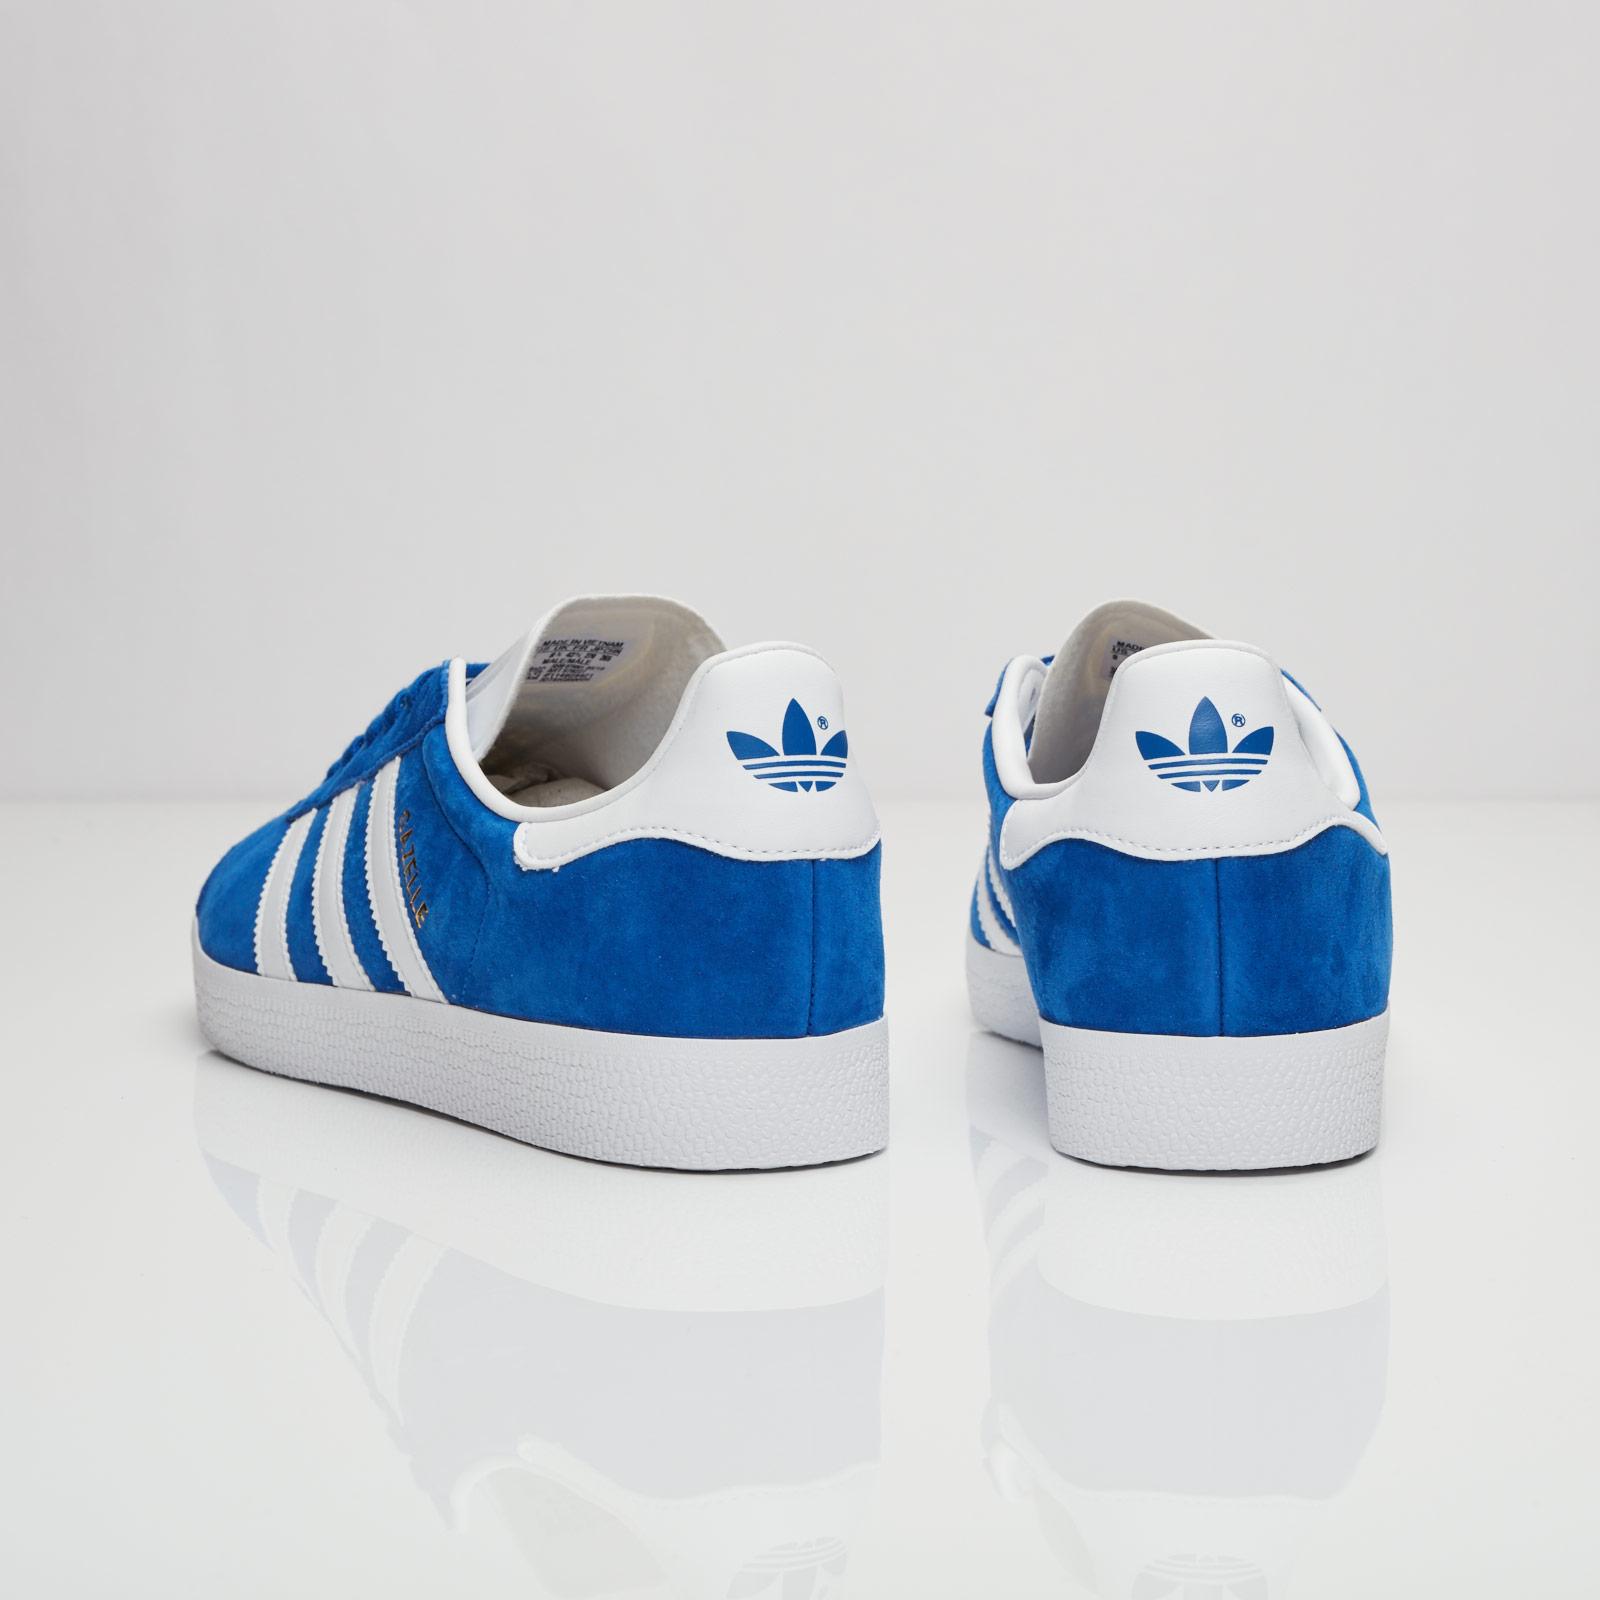 adidas Gazelle - S76227 - Sneakersnstuff  2bf6b98fa